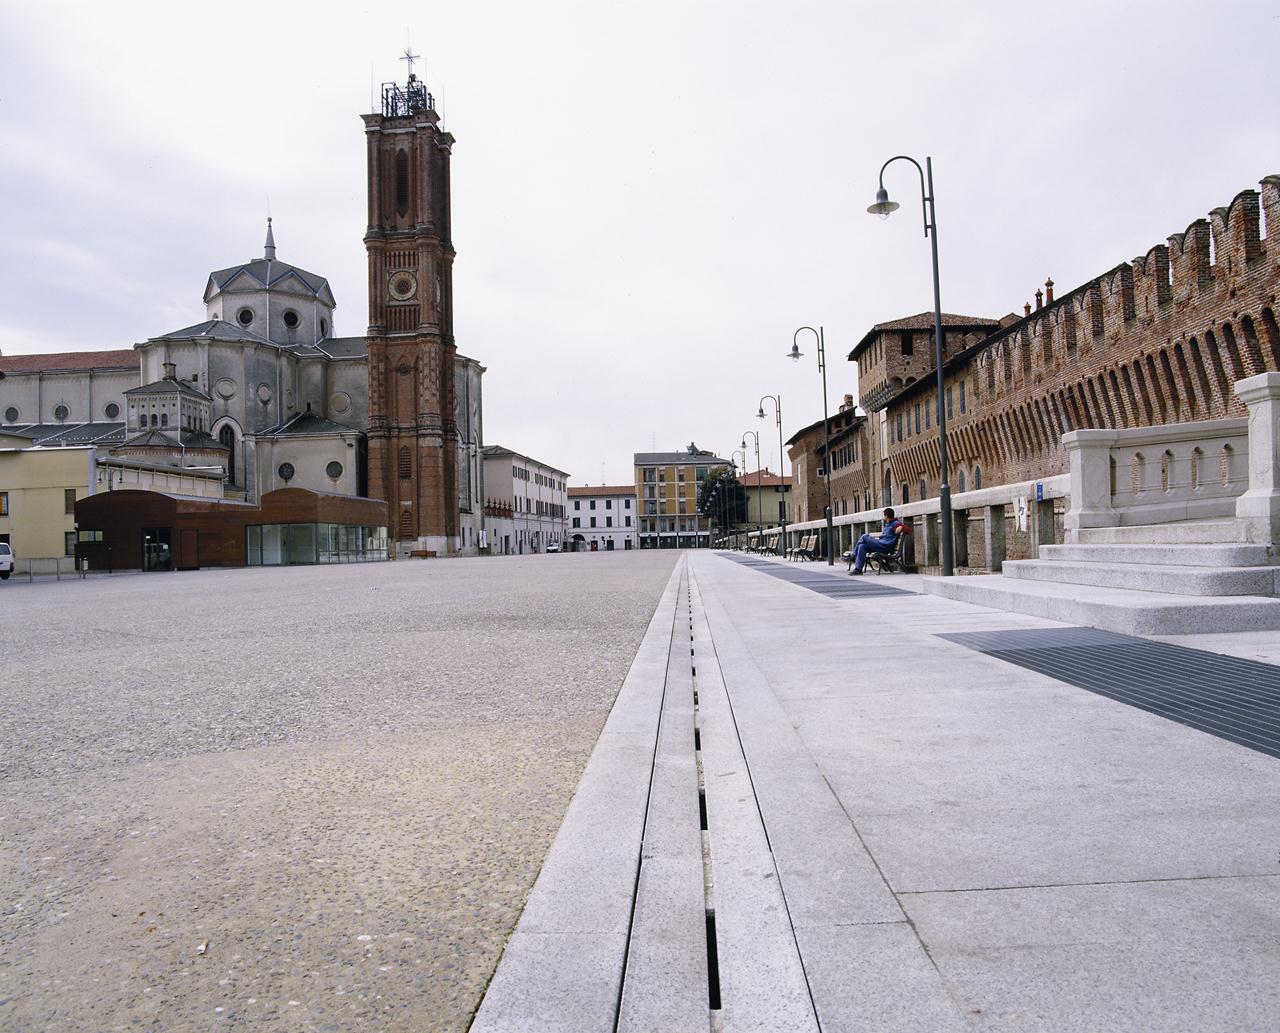 http://www.antoniolazzaretto.it/wp-content/uploads/2013/11/6-p11.jpg